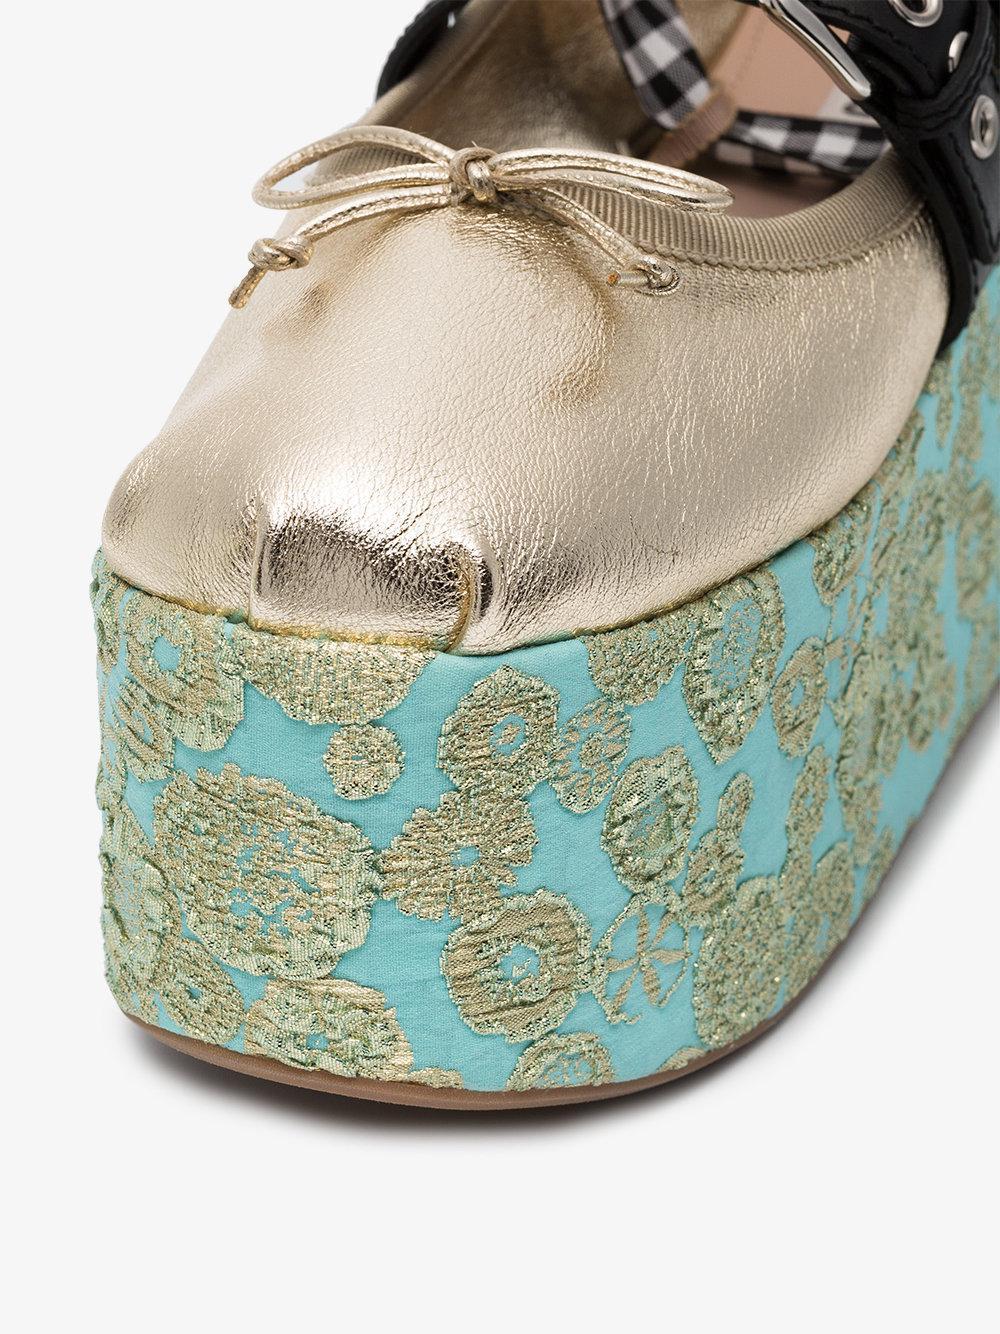 75 Chaussures Plate-forme Jacquard - Miu Miu Métallique Bm7EZa